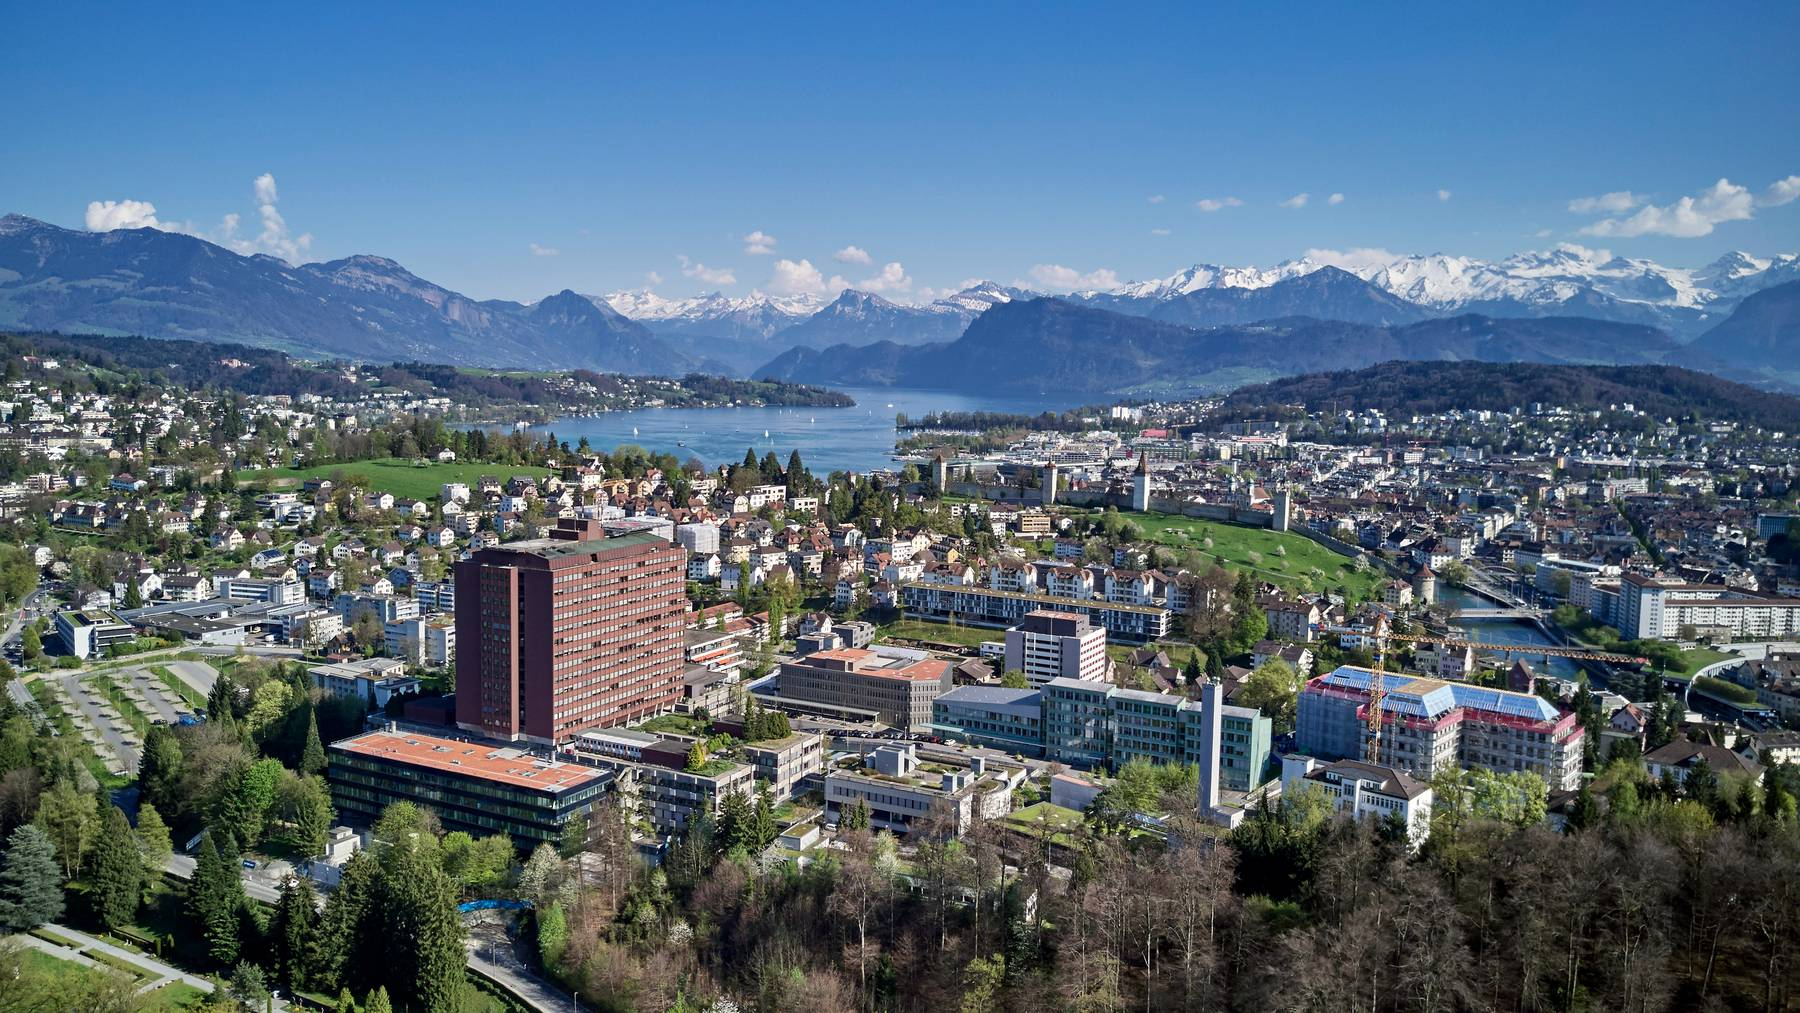 Luzerner Kantonsspital LUKS